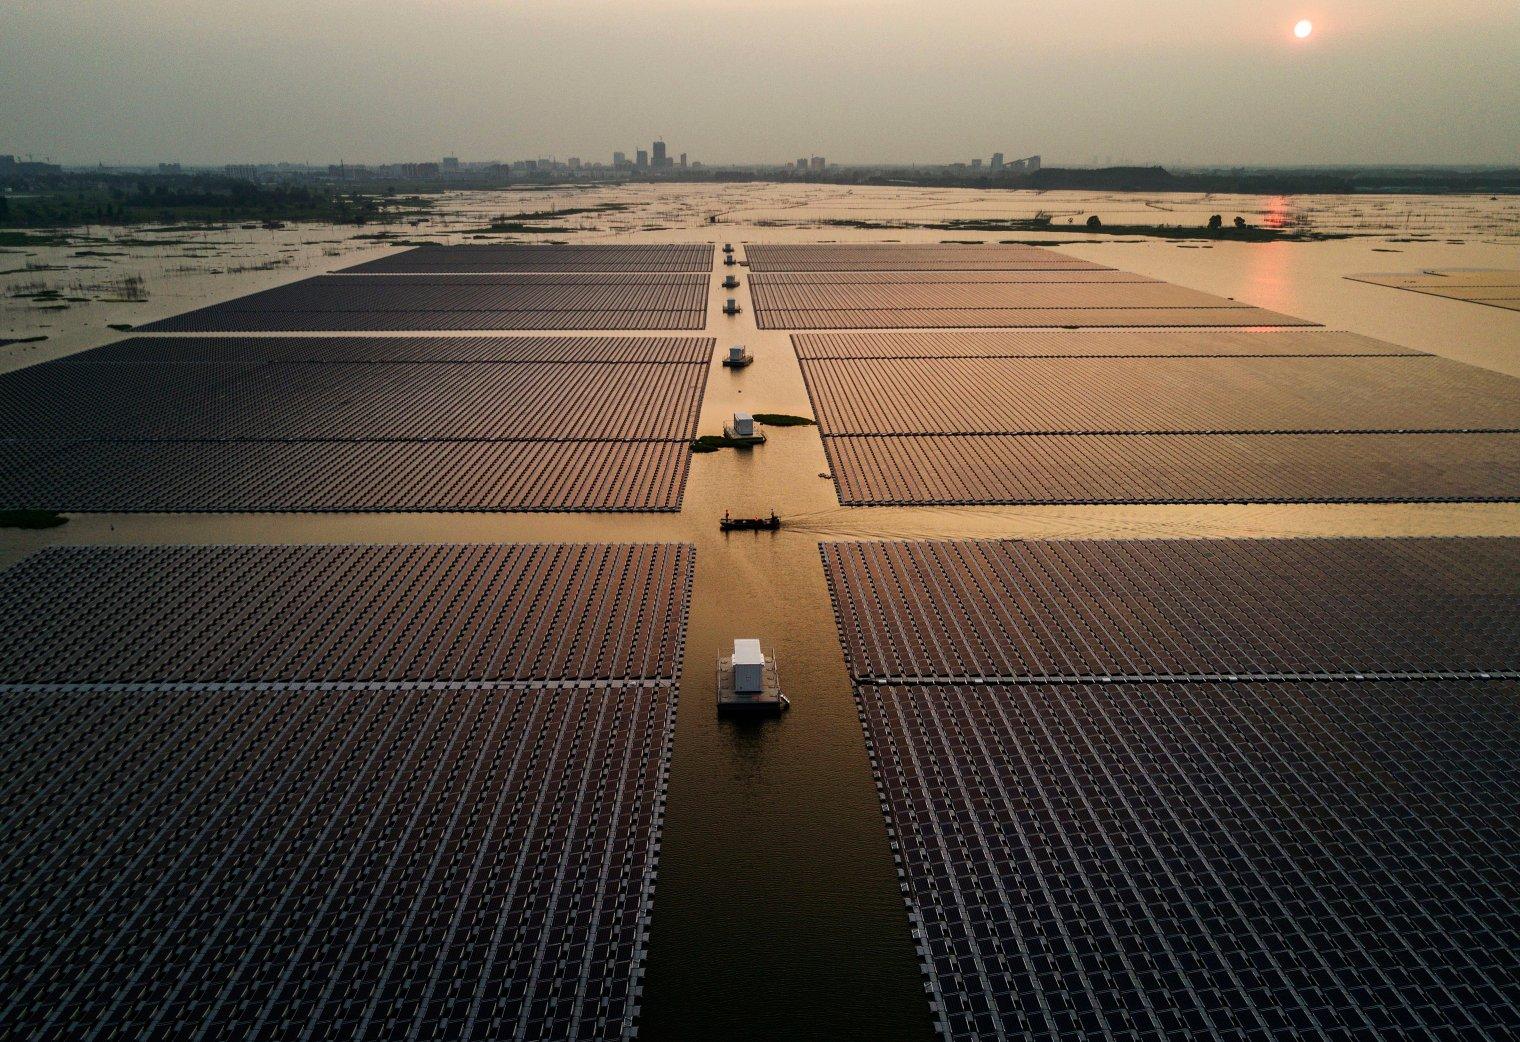 kevin-frayer-china-floating-solar-field-1.jpg